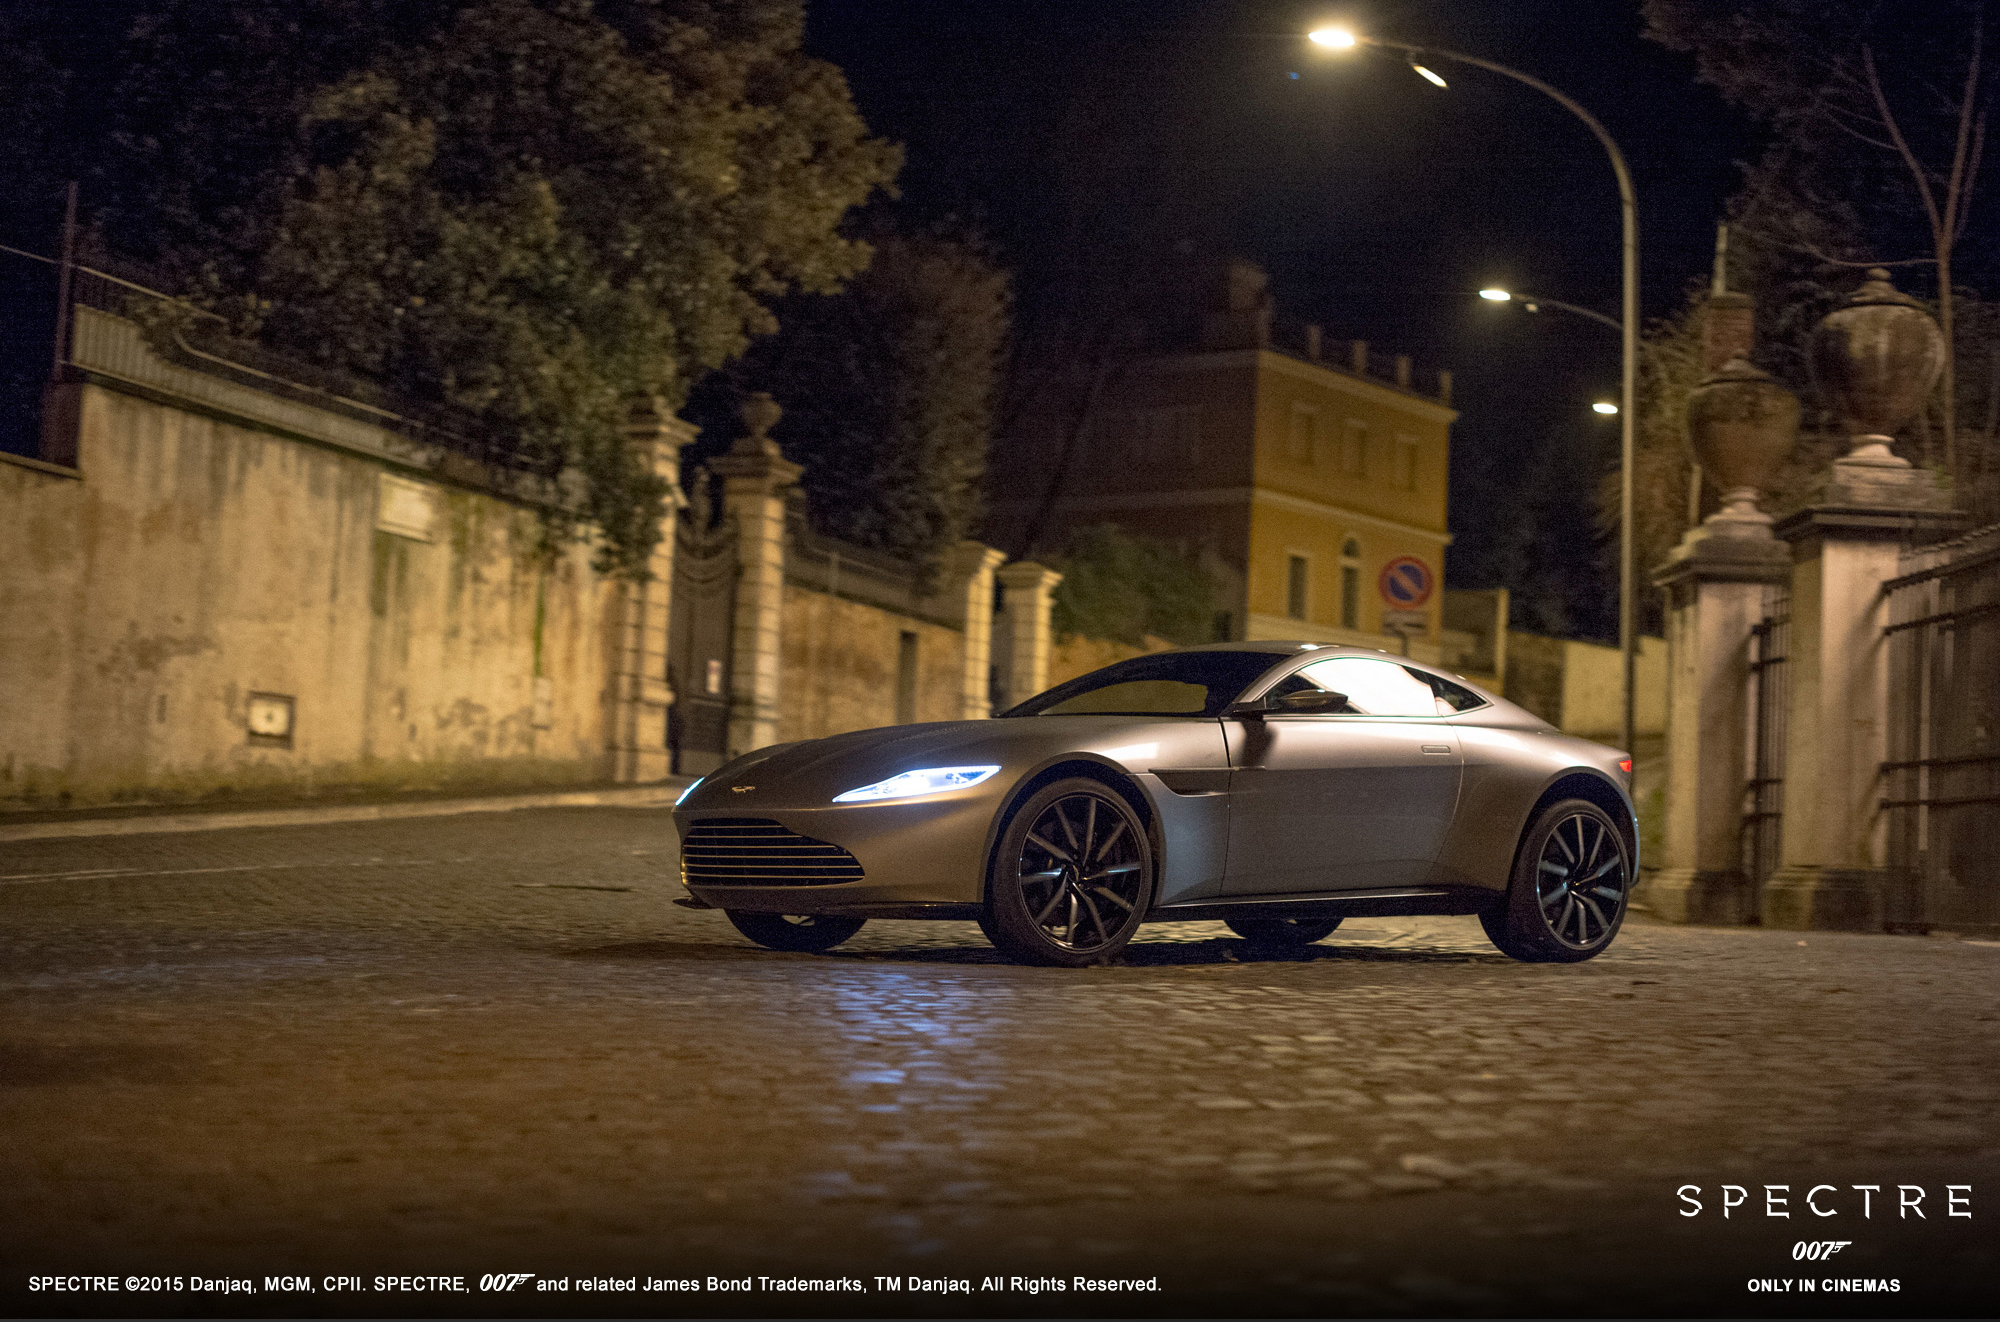 Aston Martin DB10 - Spectre 2015 - profil avant / front side-face